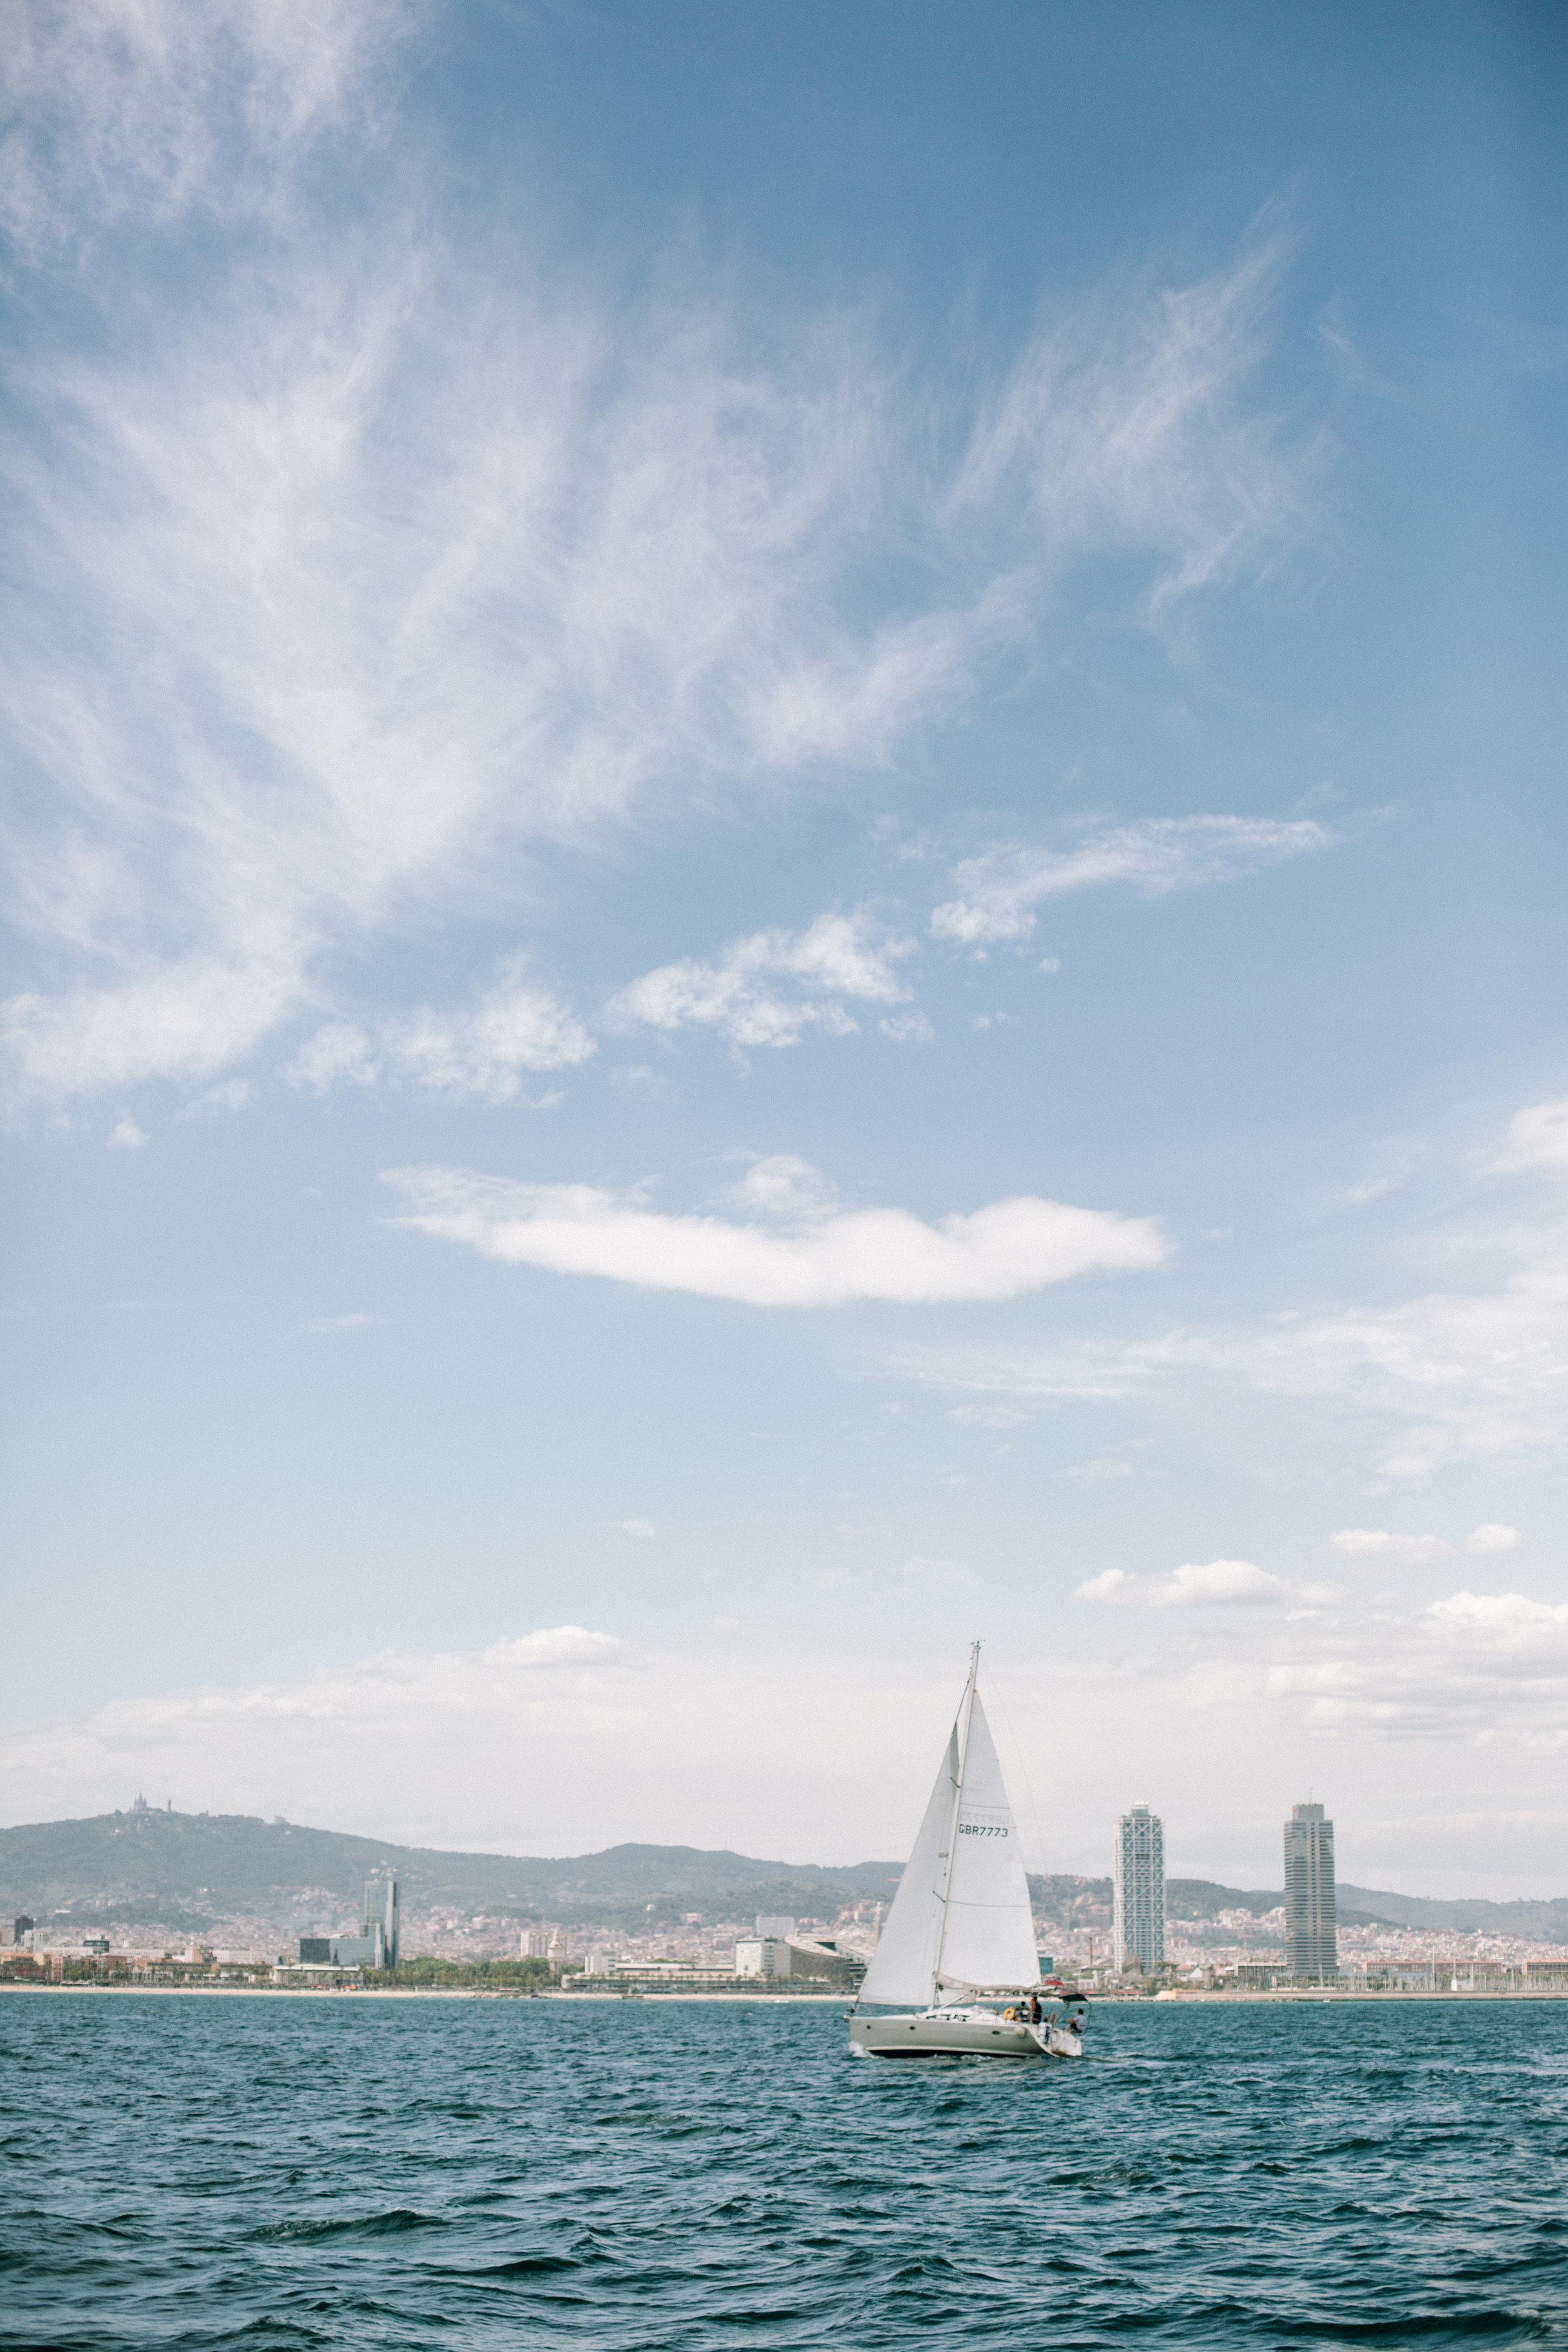 Barcelona Wedding Photographer, Barcelona Bridal Week, Leanne Marshall, Once wed, Darling, Zara, Zara Barcelona, Parque de Laborint de l'horta, Airbnb, Cotton House Hotel, Barcelona Photographer, Travel, Travel Barcelona, Travel Spain, Spain Wedding Photographer